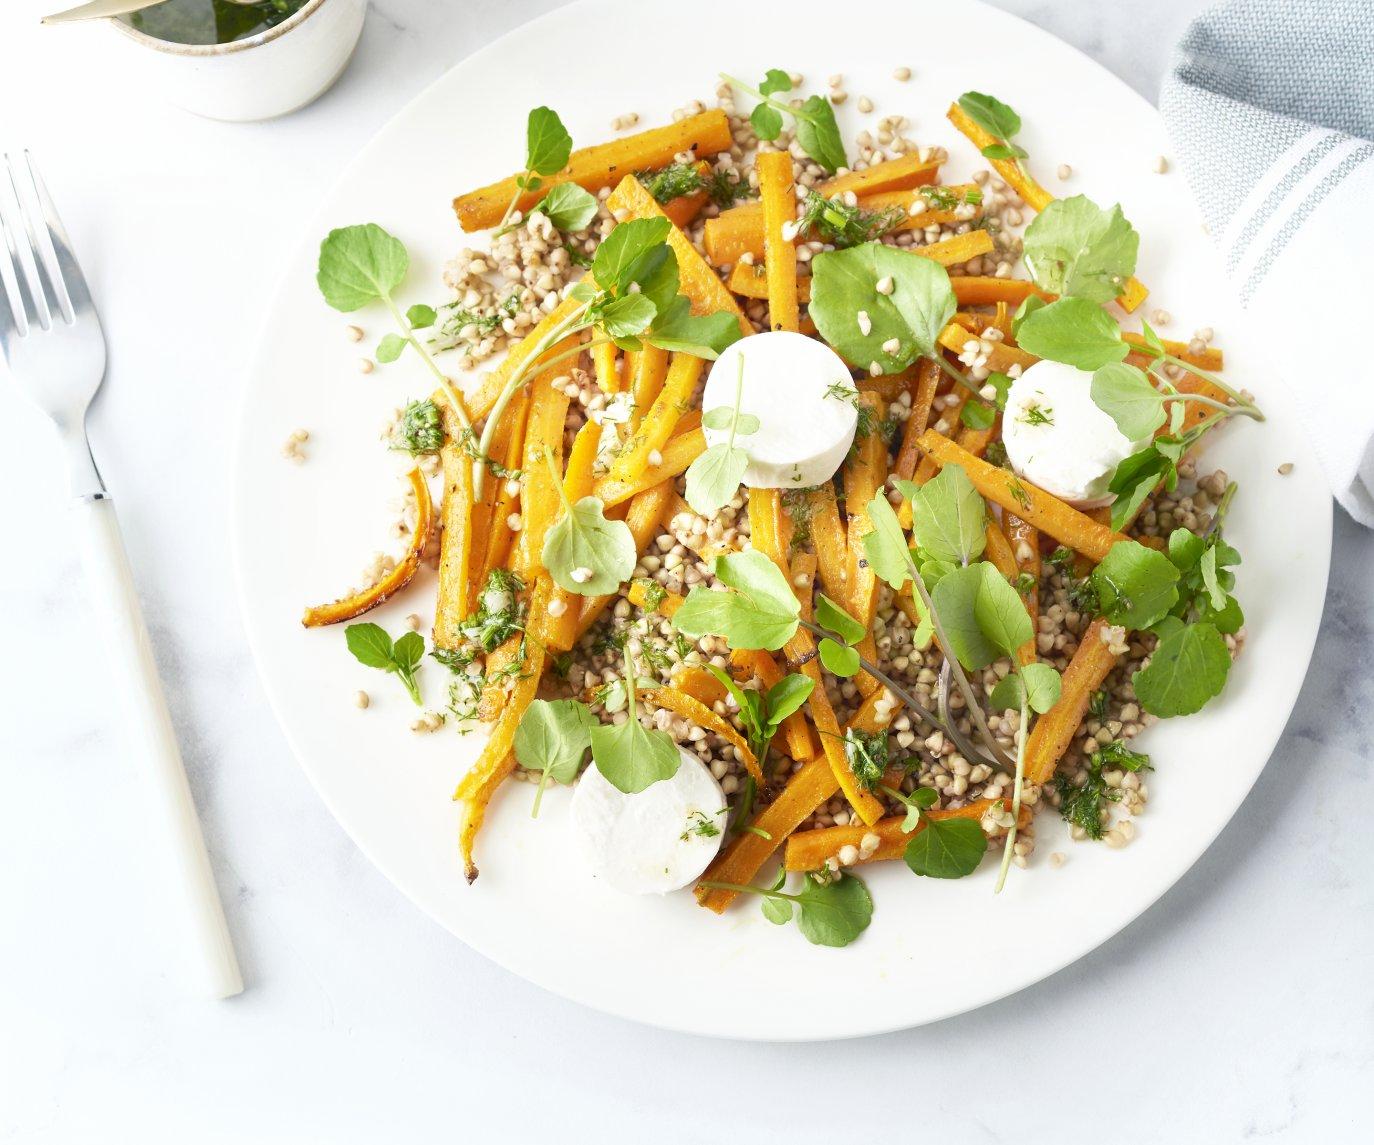 Herfstsalade met boekweit, geroosterde wortel en geitenkaas